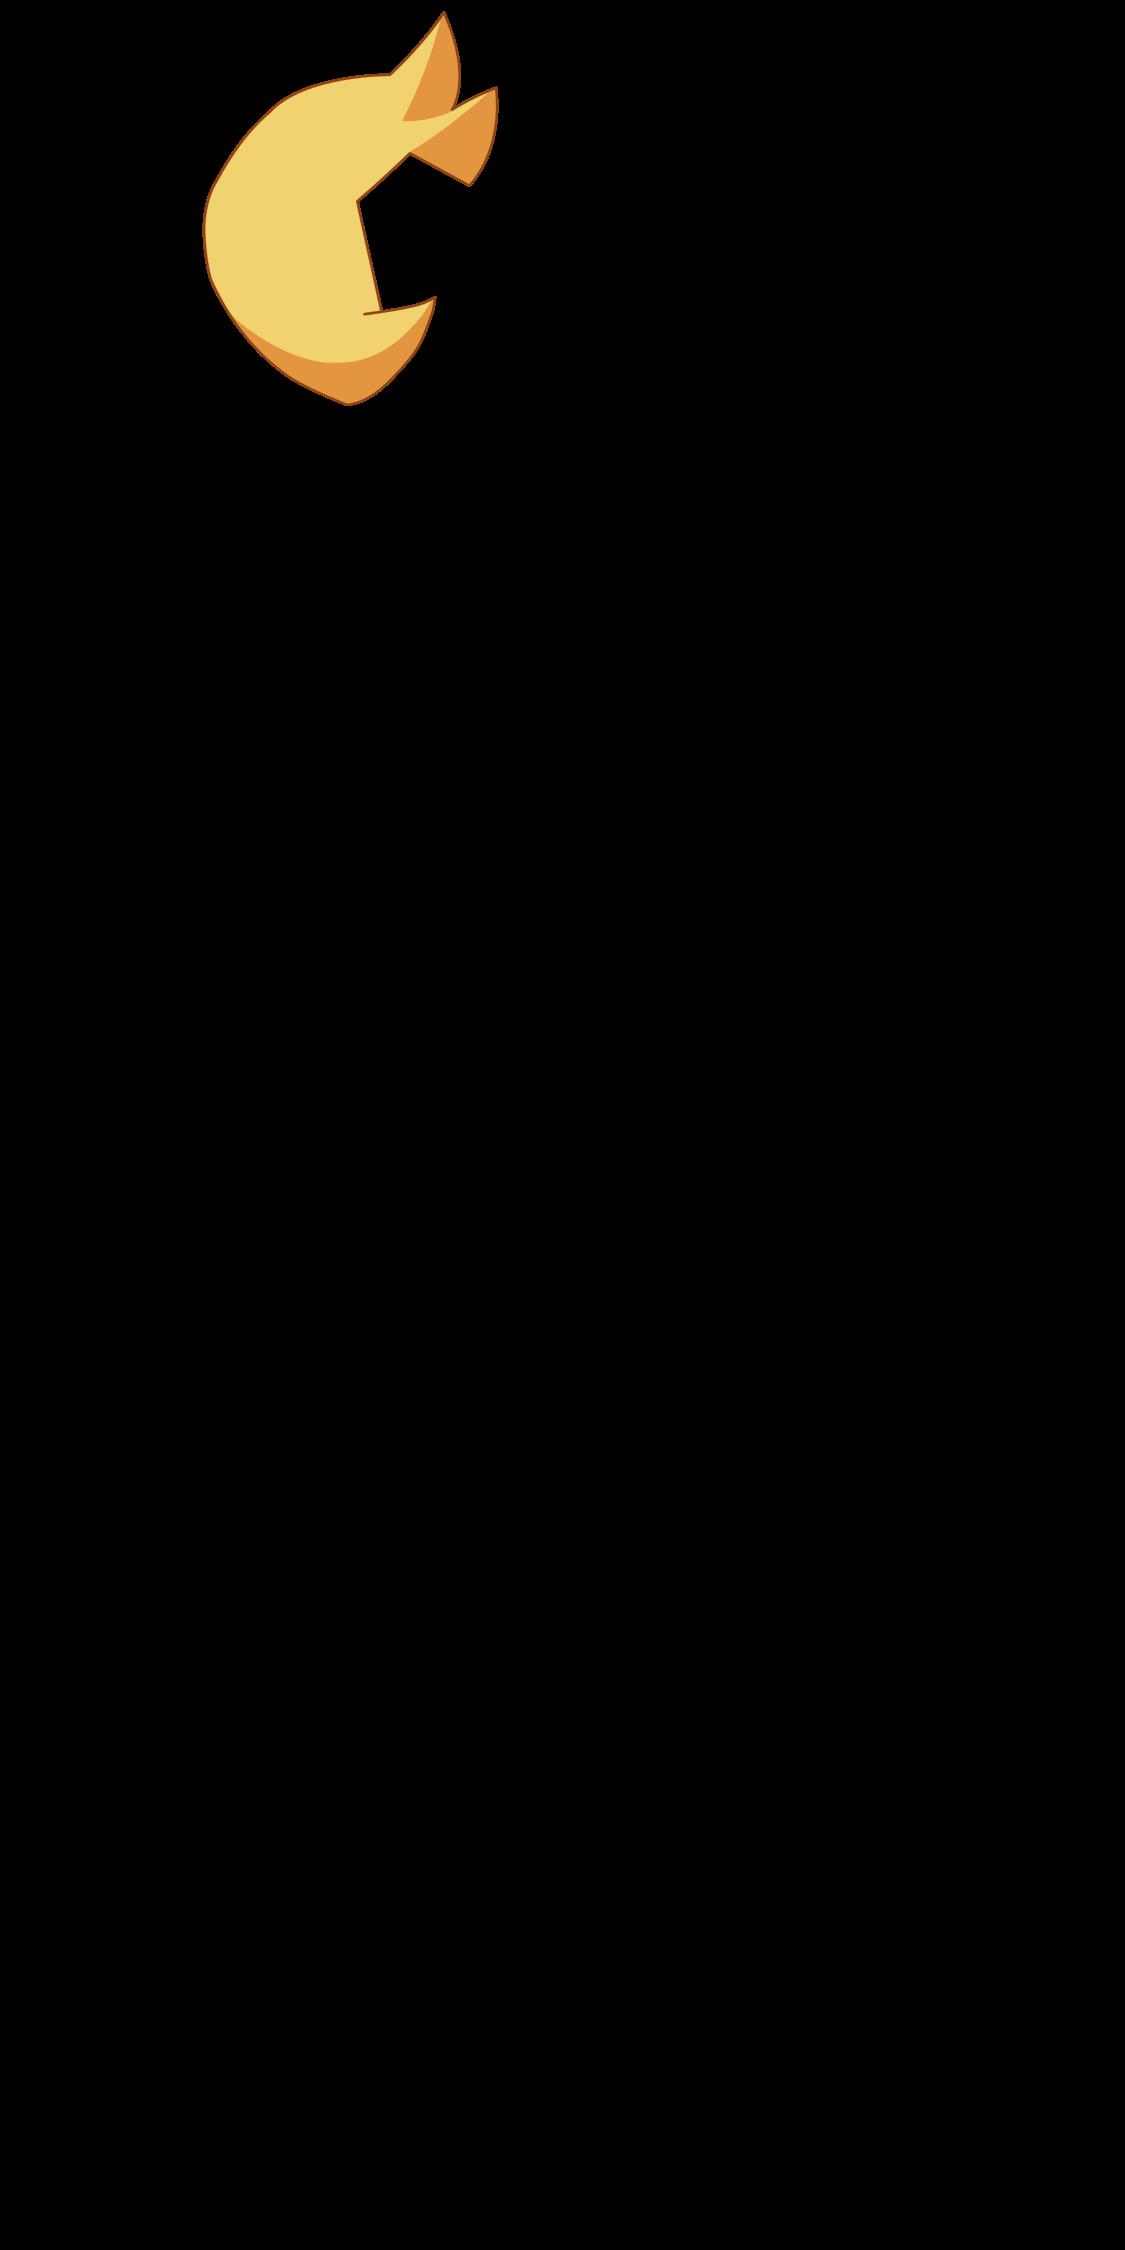 Steven Universe - Yellow Diamond.svg.png